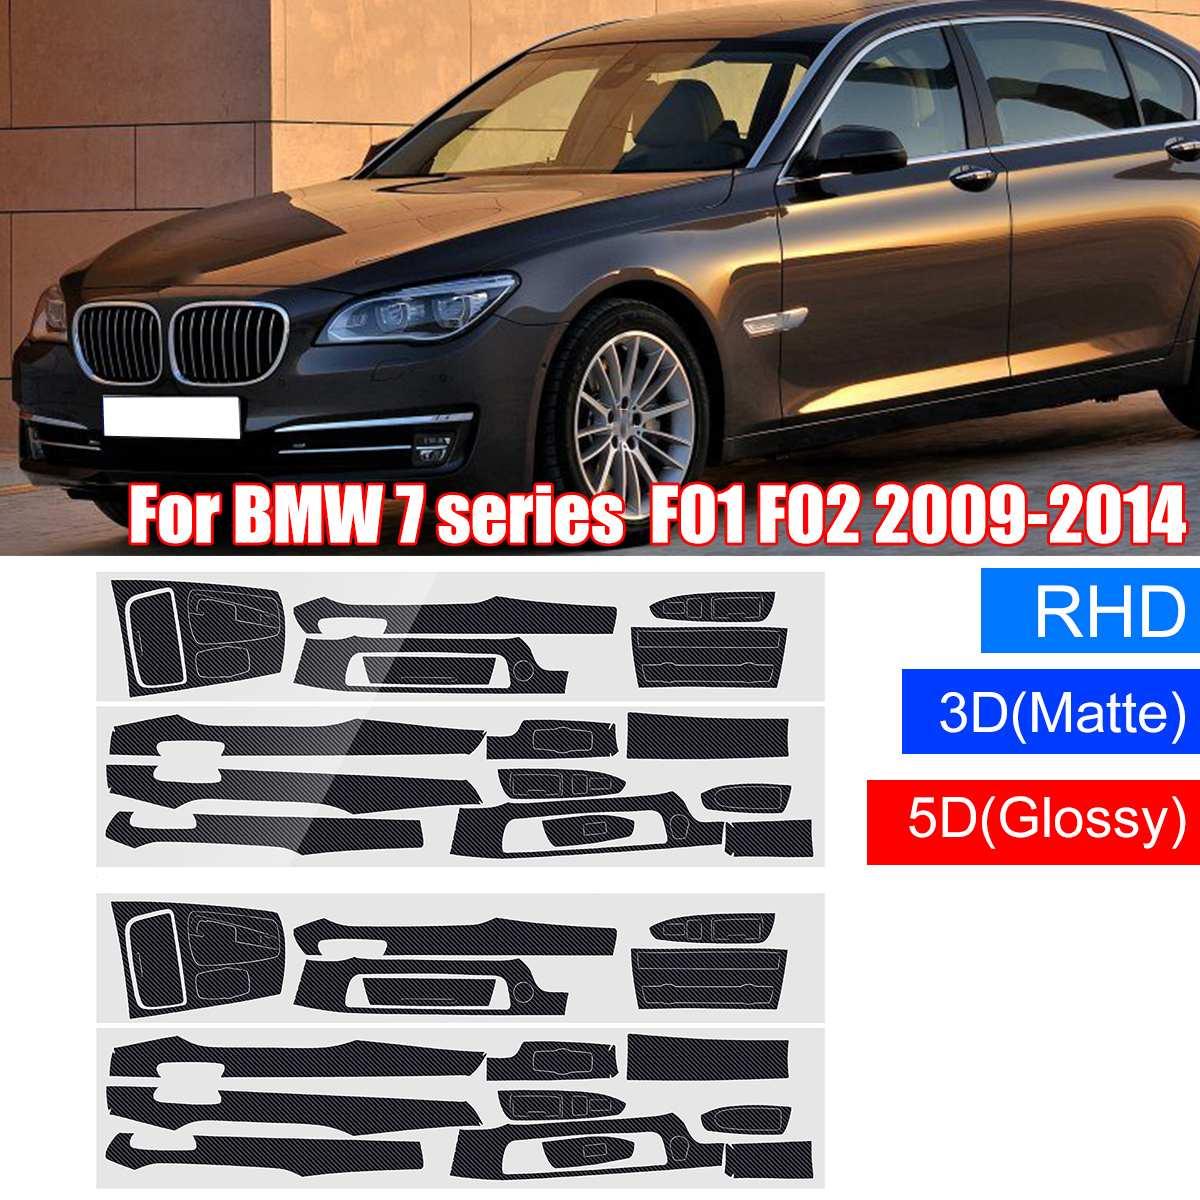 Carbon Fiber Pillar Panel Covers for 2009-2015 BMW F01 7-Series F02 Sedan